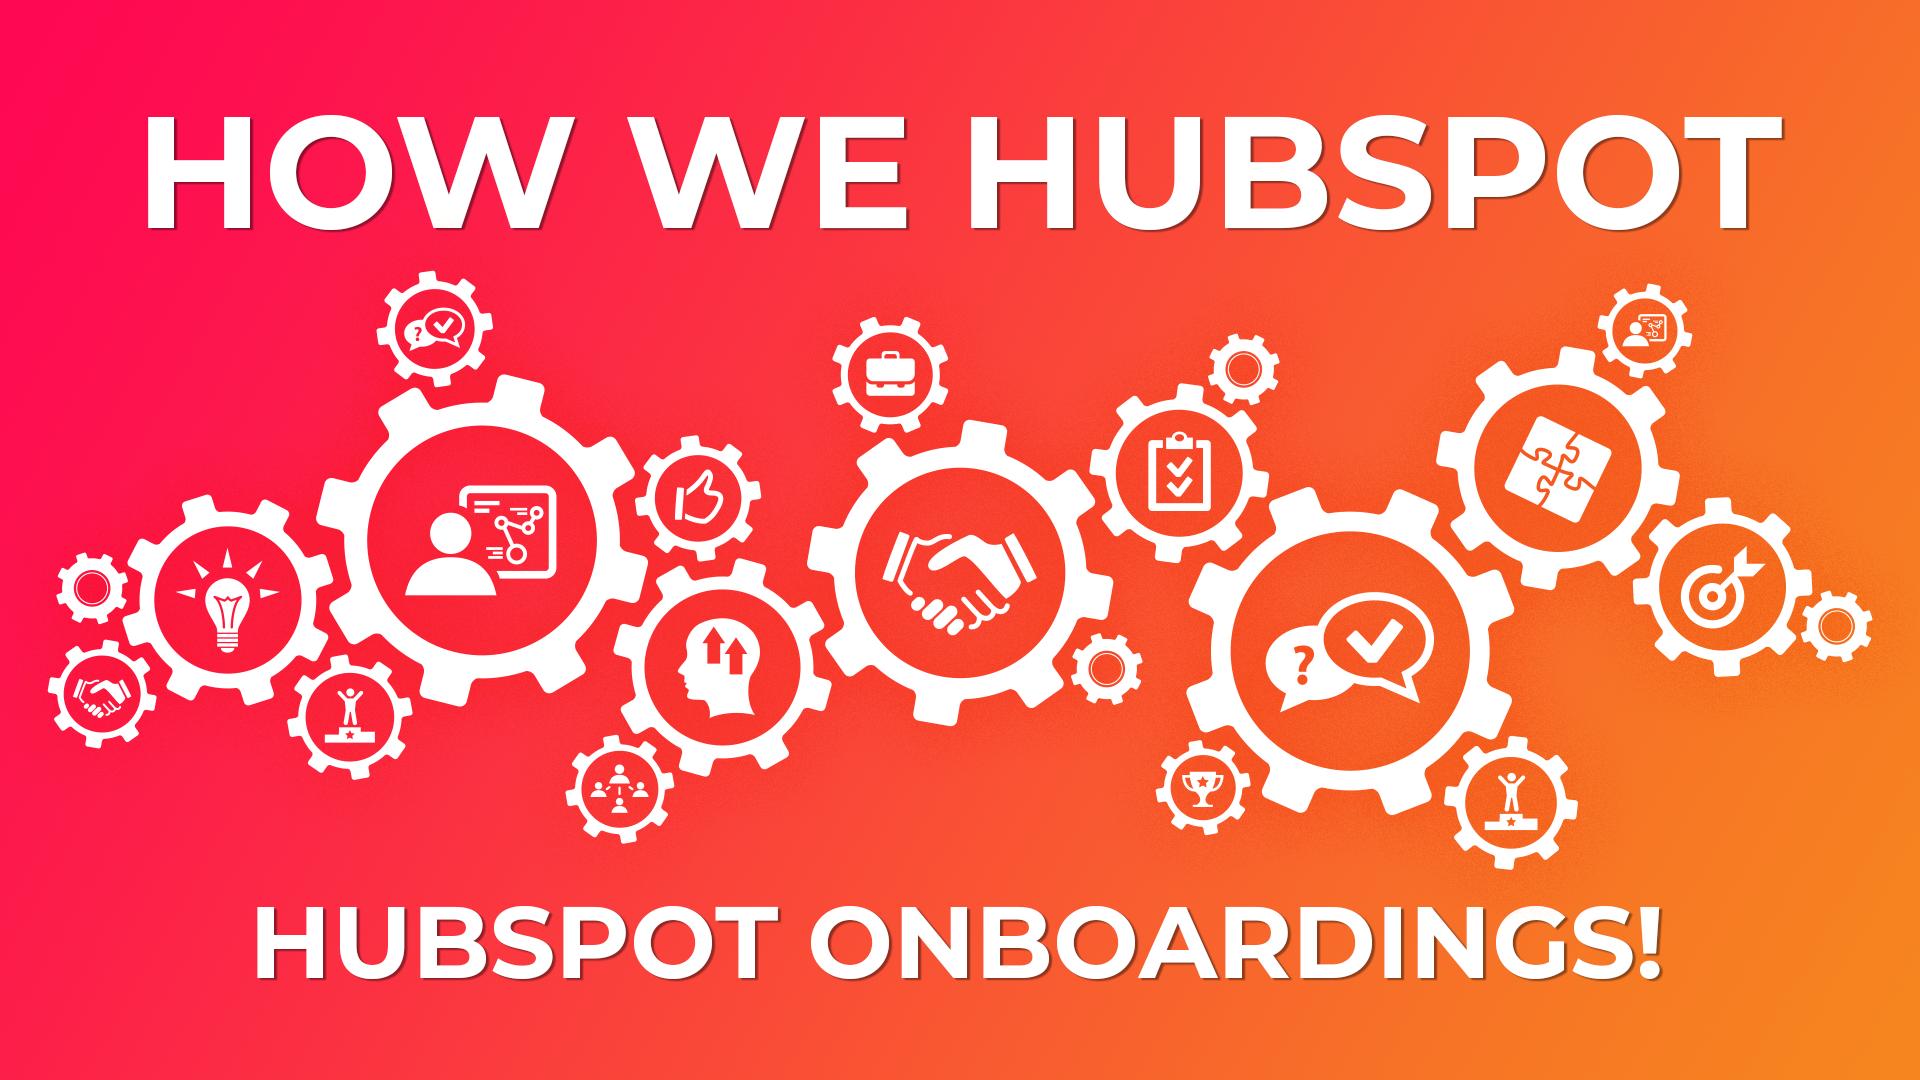 HubSpot Onboardings - Featured Image